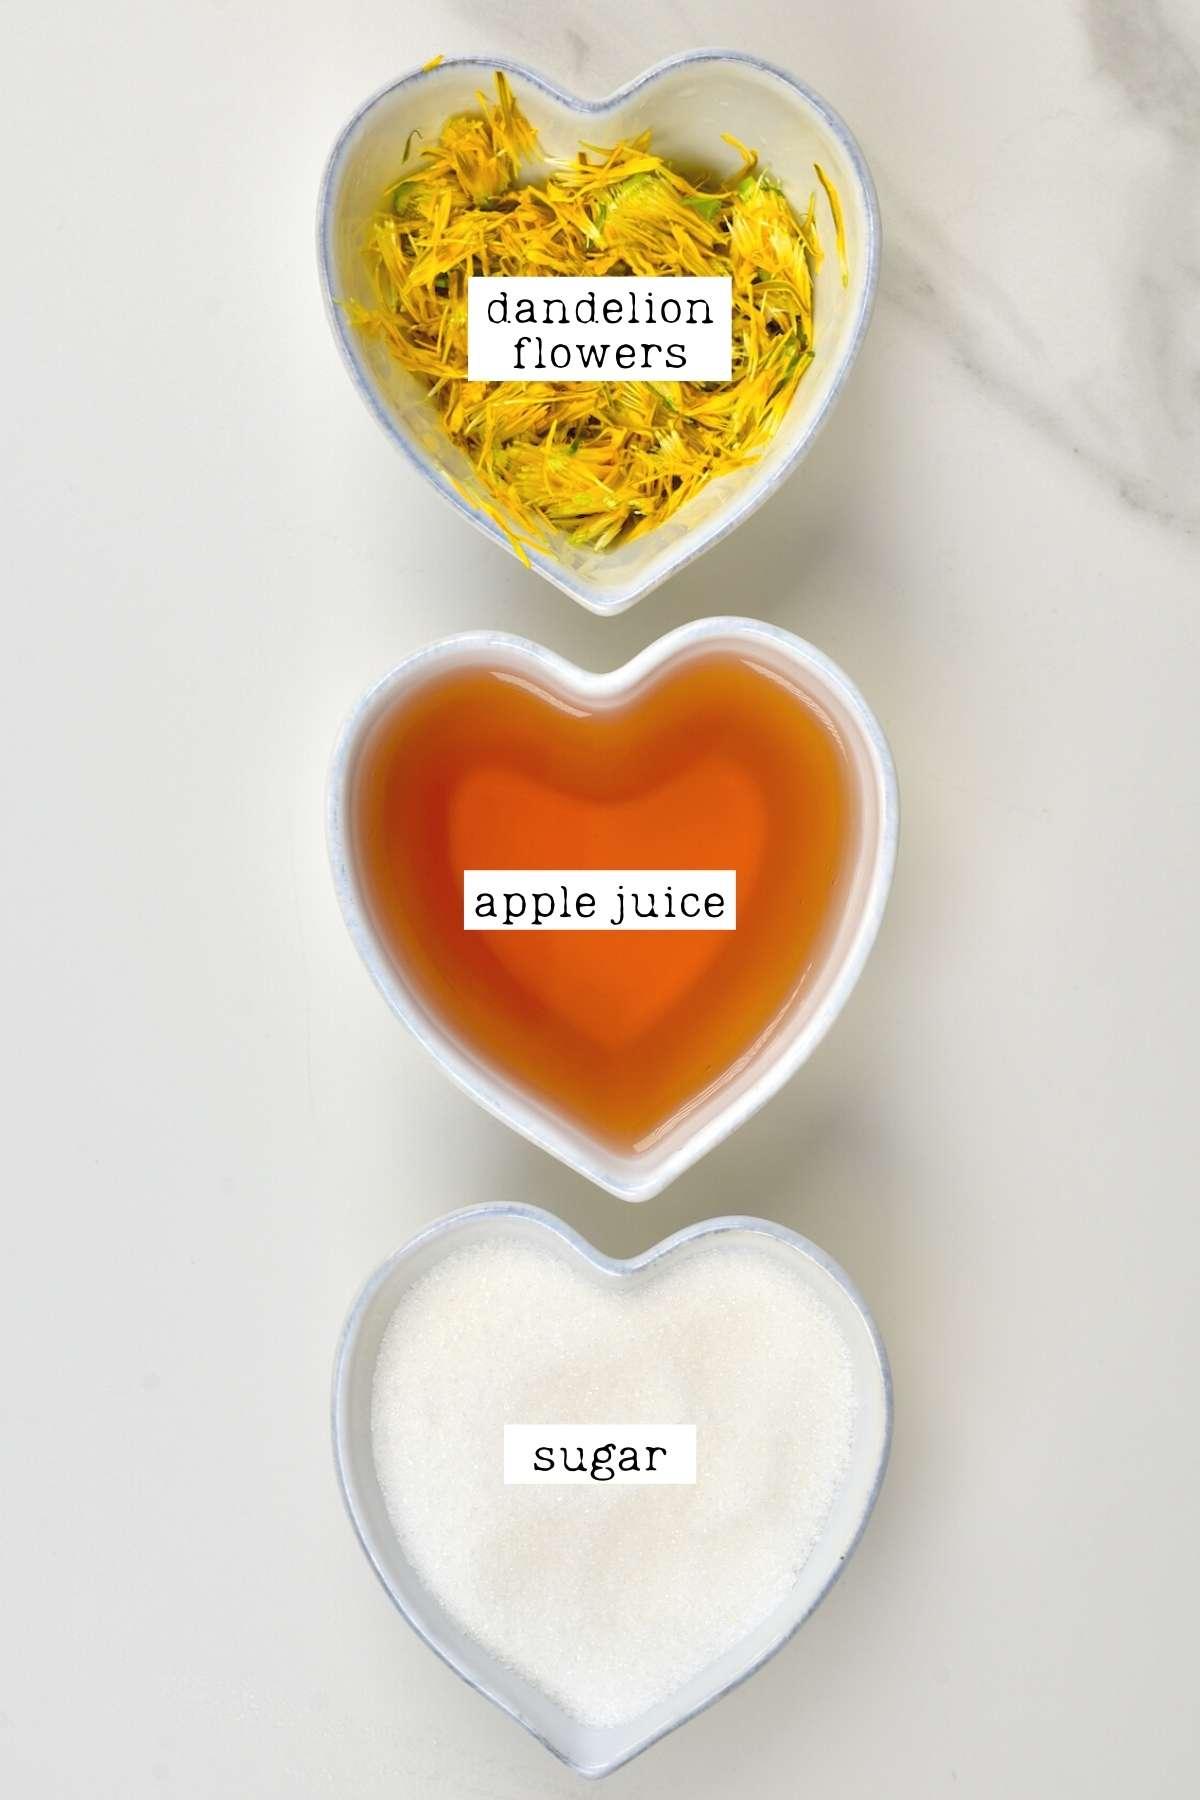 Ingredients for dandelion syrup